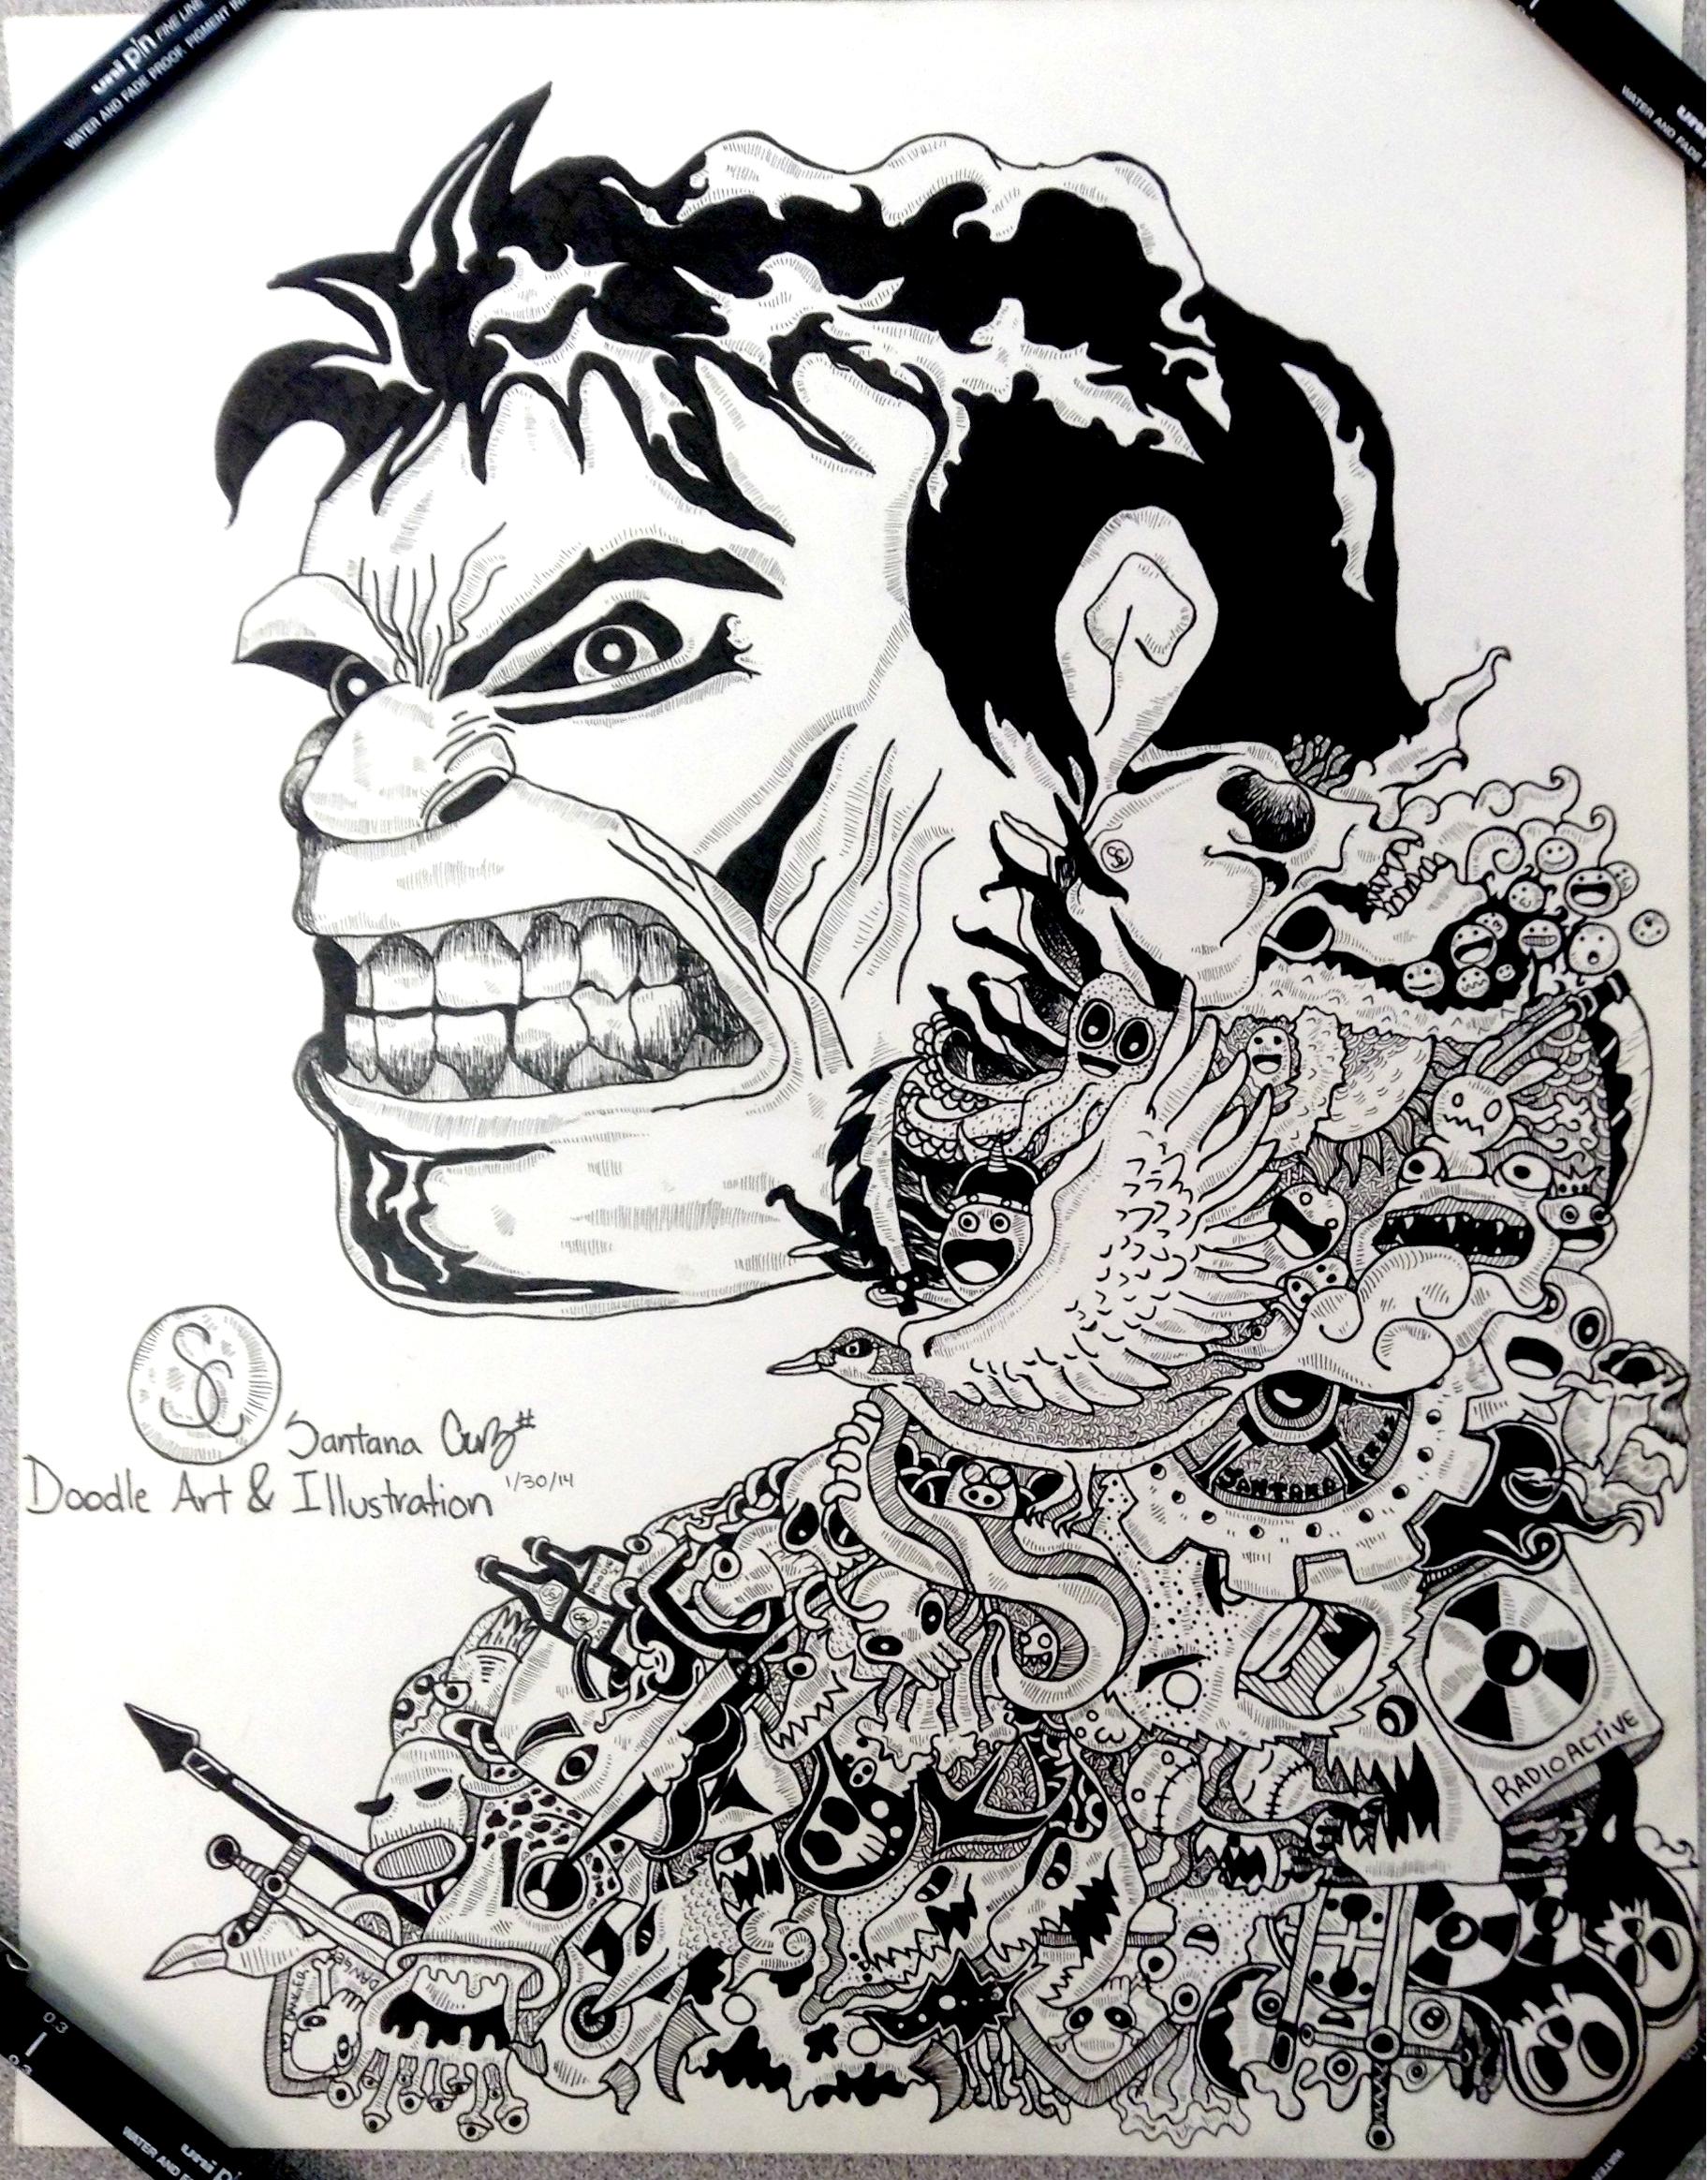 Why so angry? by Santanacruz